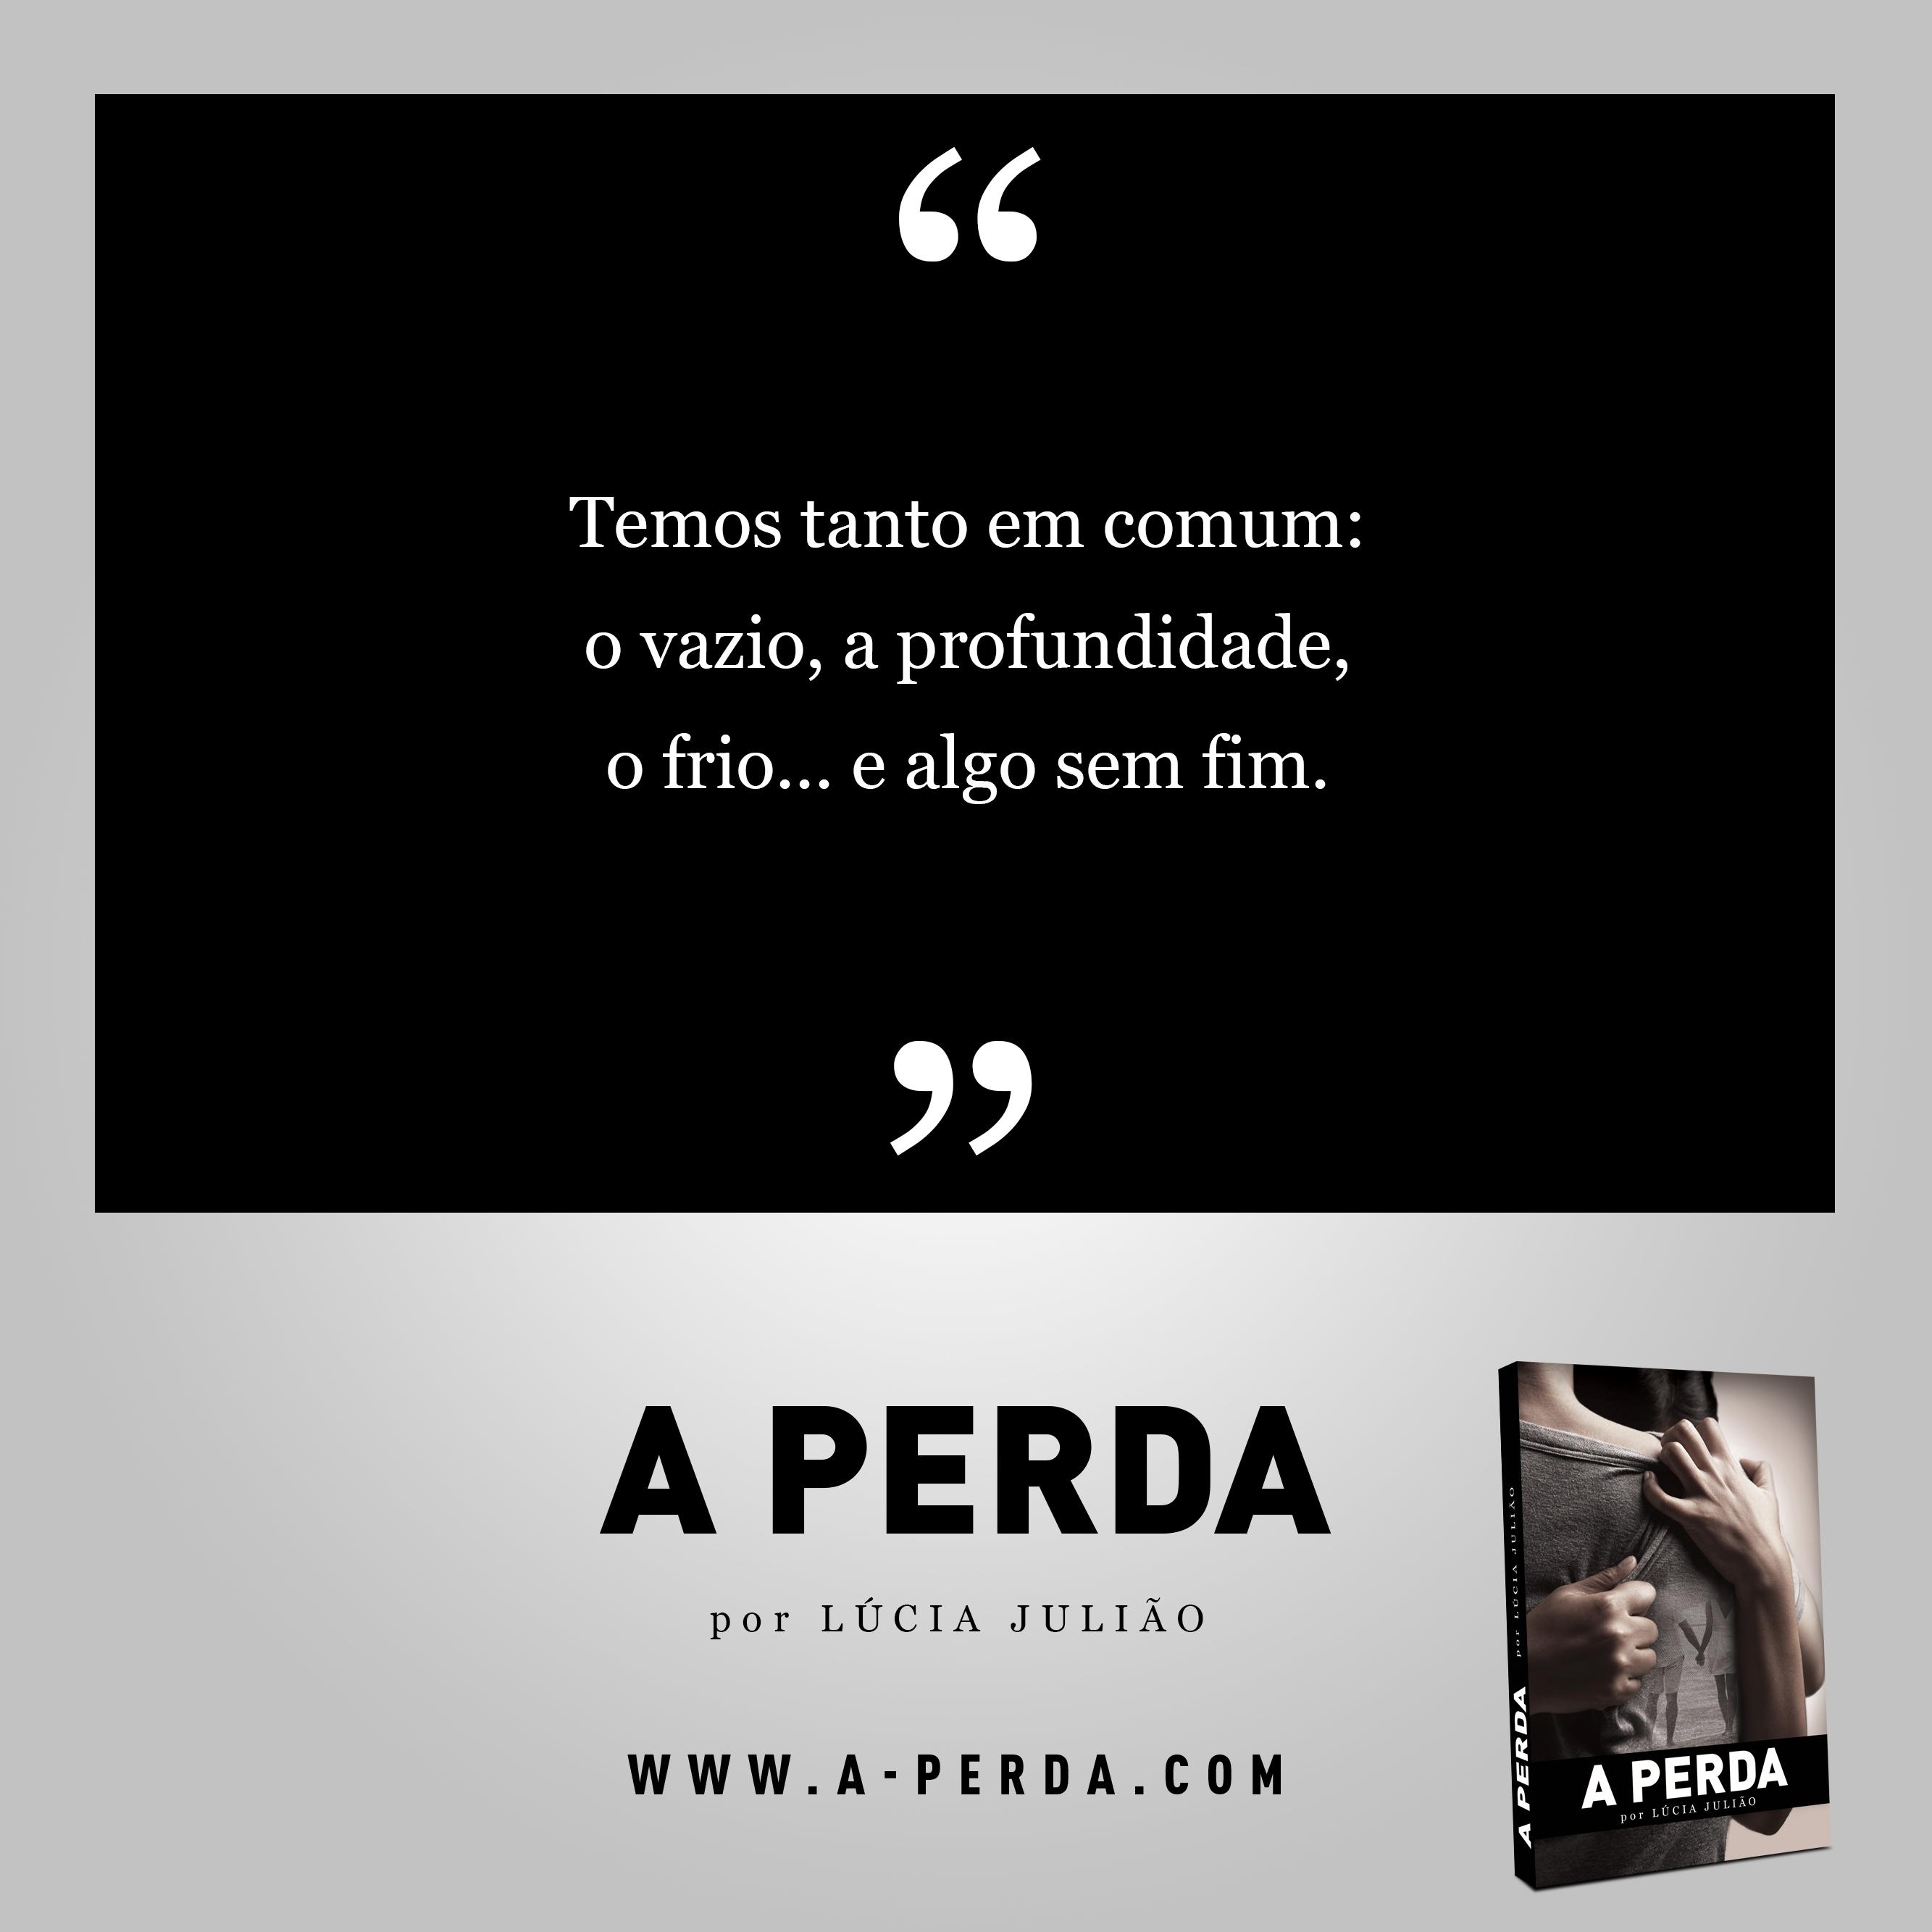 021-capitulo-44-livro-a-Perda-de-Lucia-Juliao-Instagram